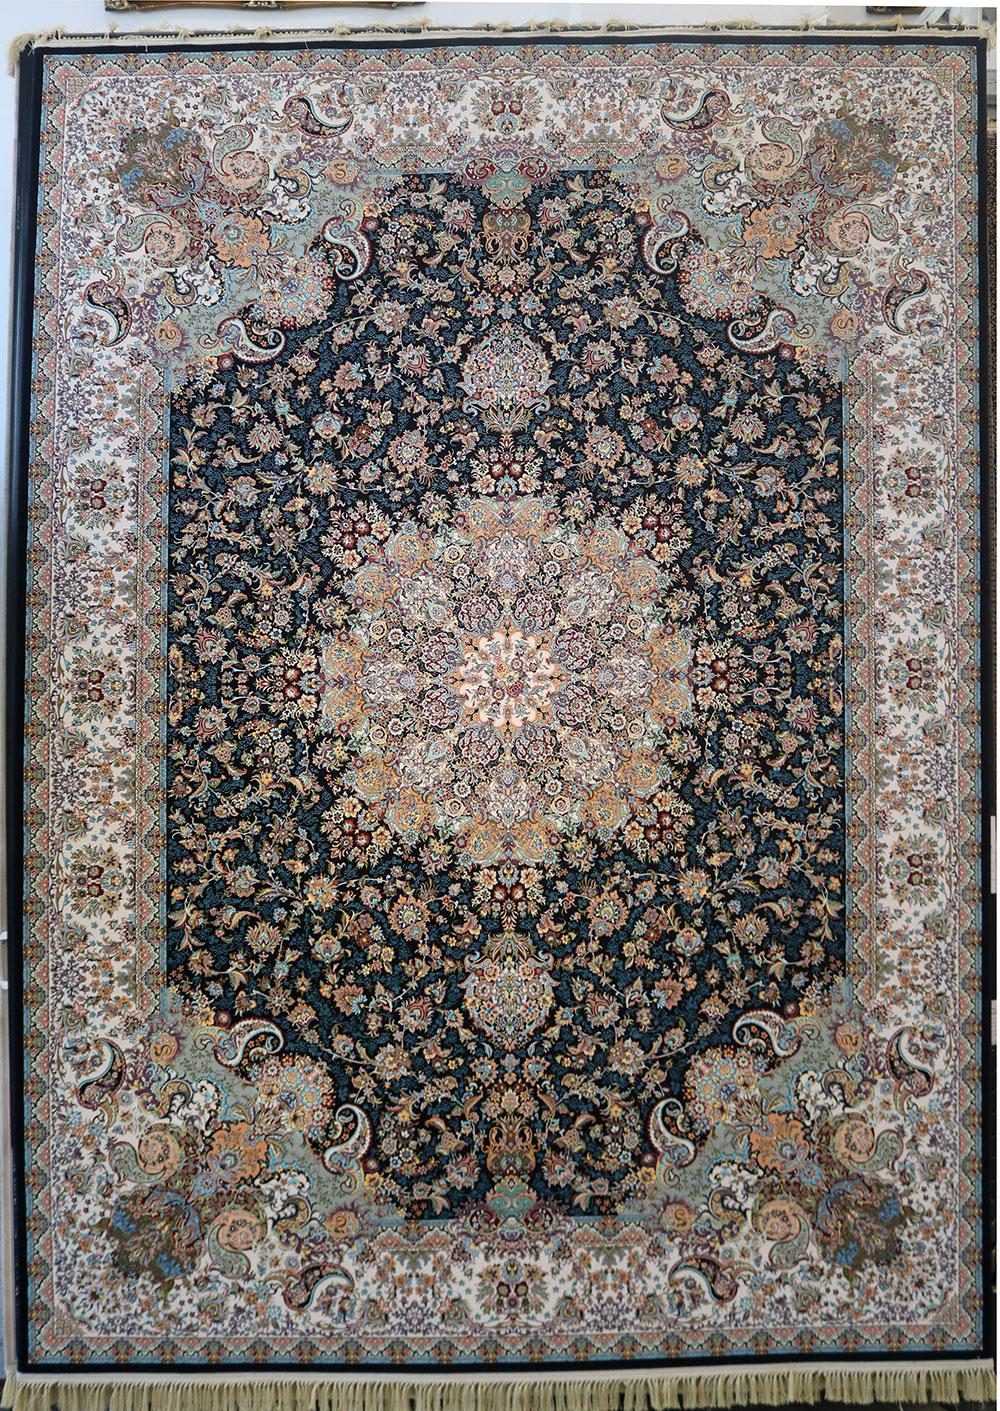 فرش کاشان- نقشه هزار گل ۱۲۰۰ شانه